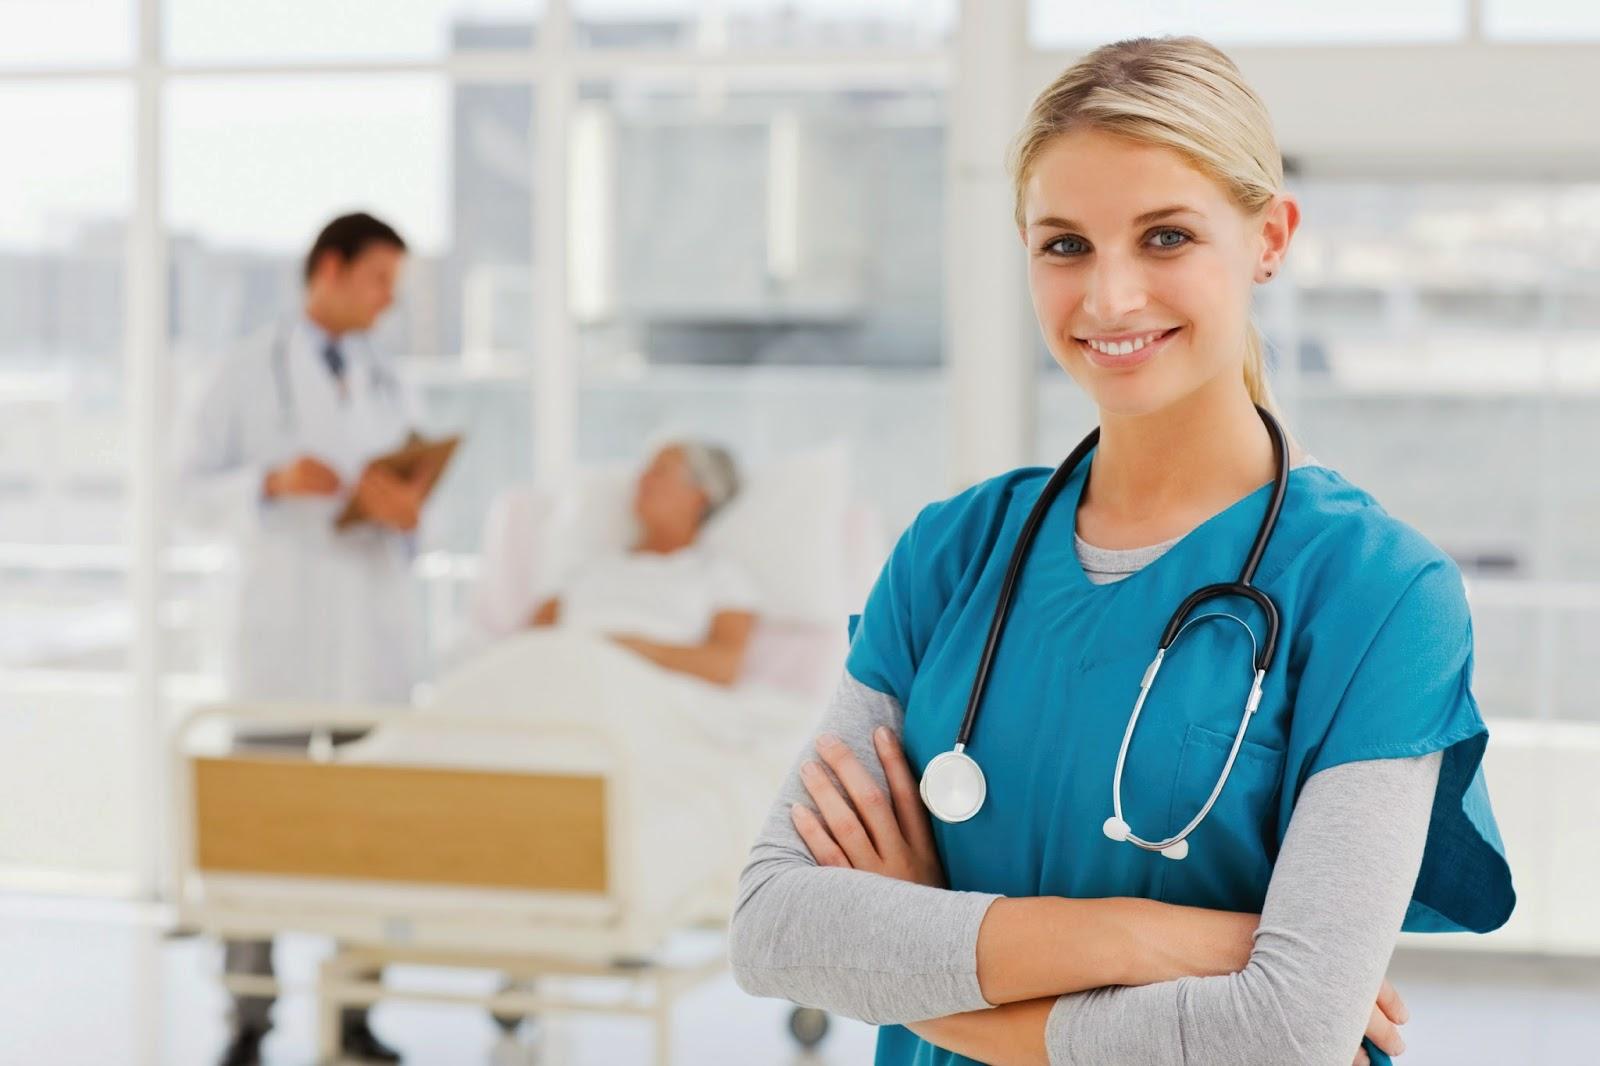 Ministry of health dubai uae nurse job vacancies apply online 171 job